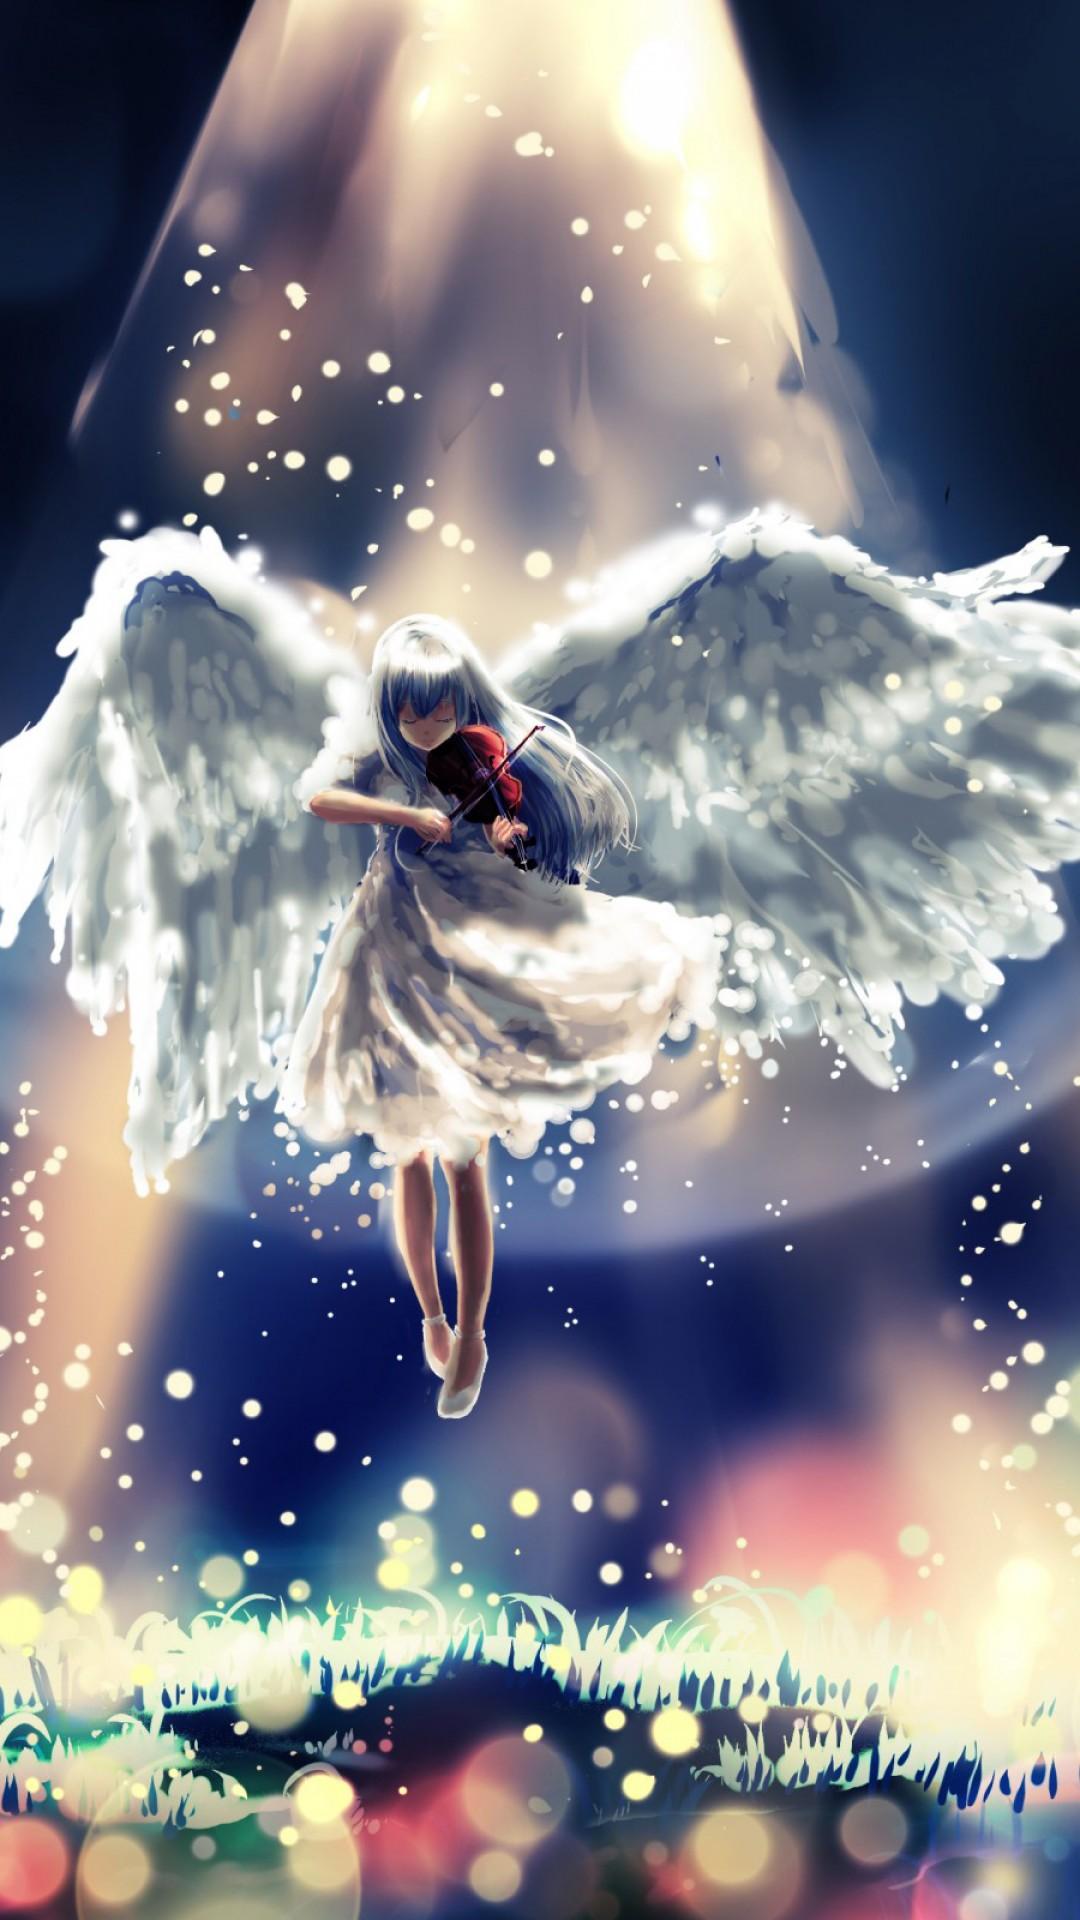 Wallpaper anime angel beats art 14470 - Anime wallpaper angel ...